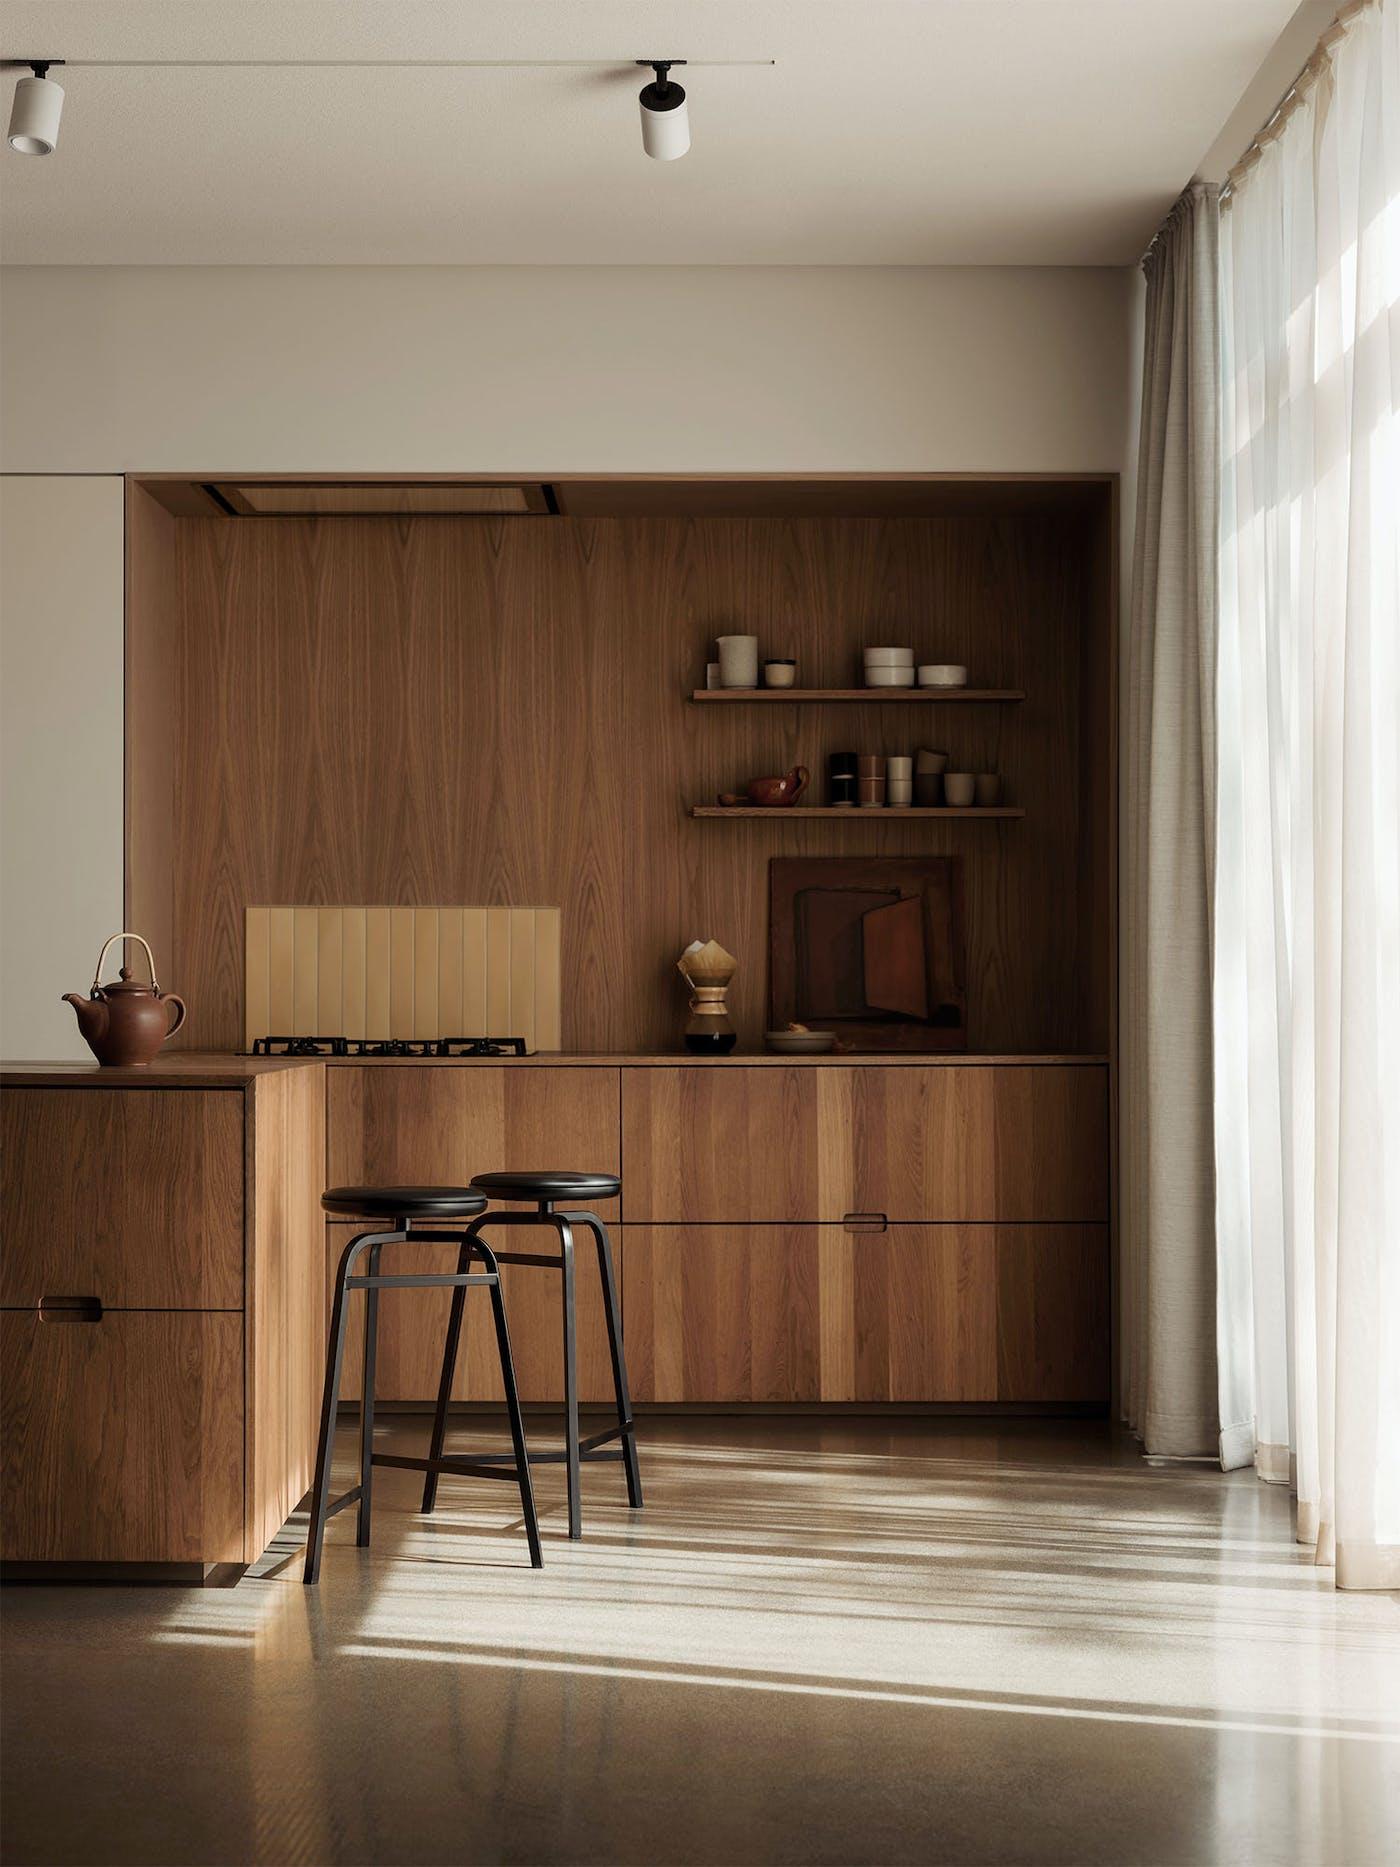 Treble bar stools black kitchen Northern Photo Einar Aslaksen Low res